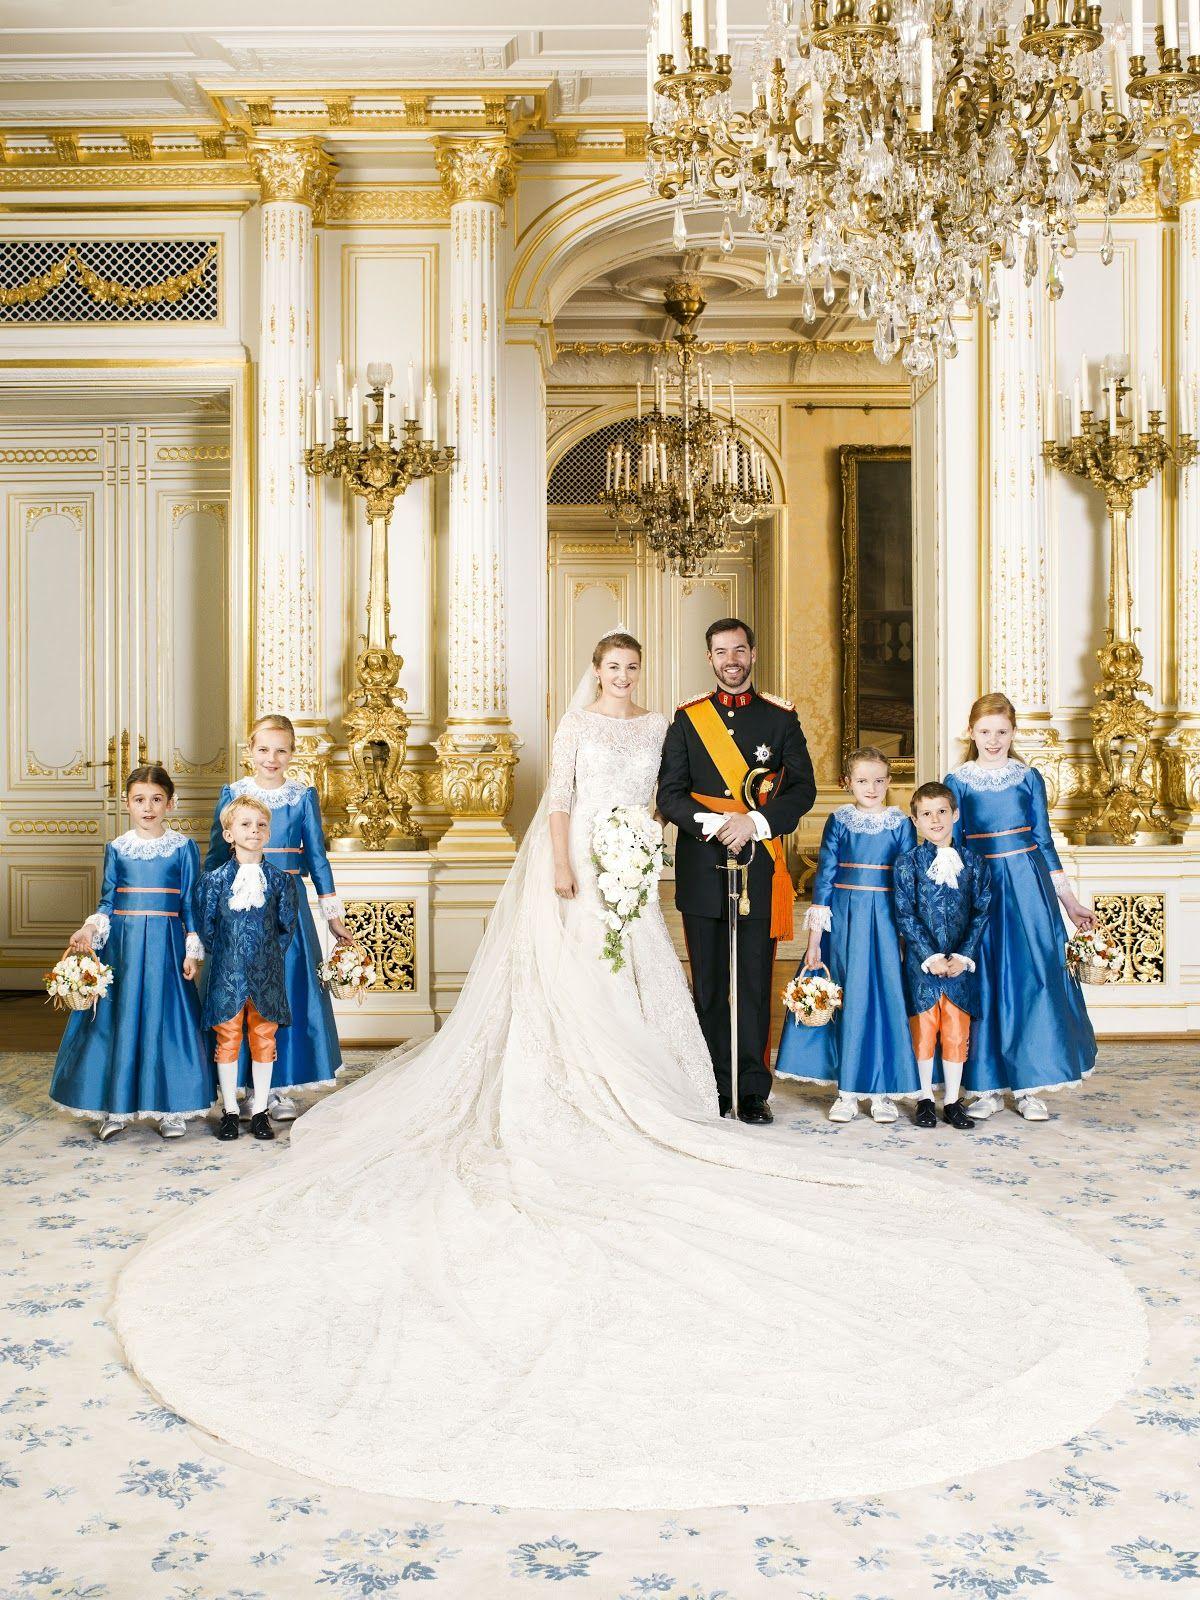 Luxarazzi Royal Wedding Dress Royal Weddings Royal Brides [ 1600 x 1200 Pixel ]